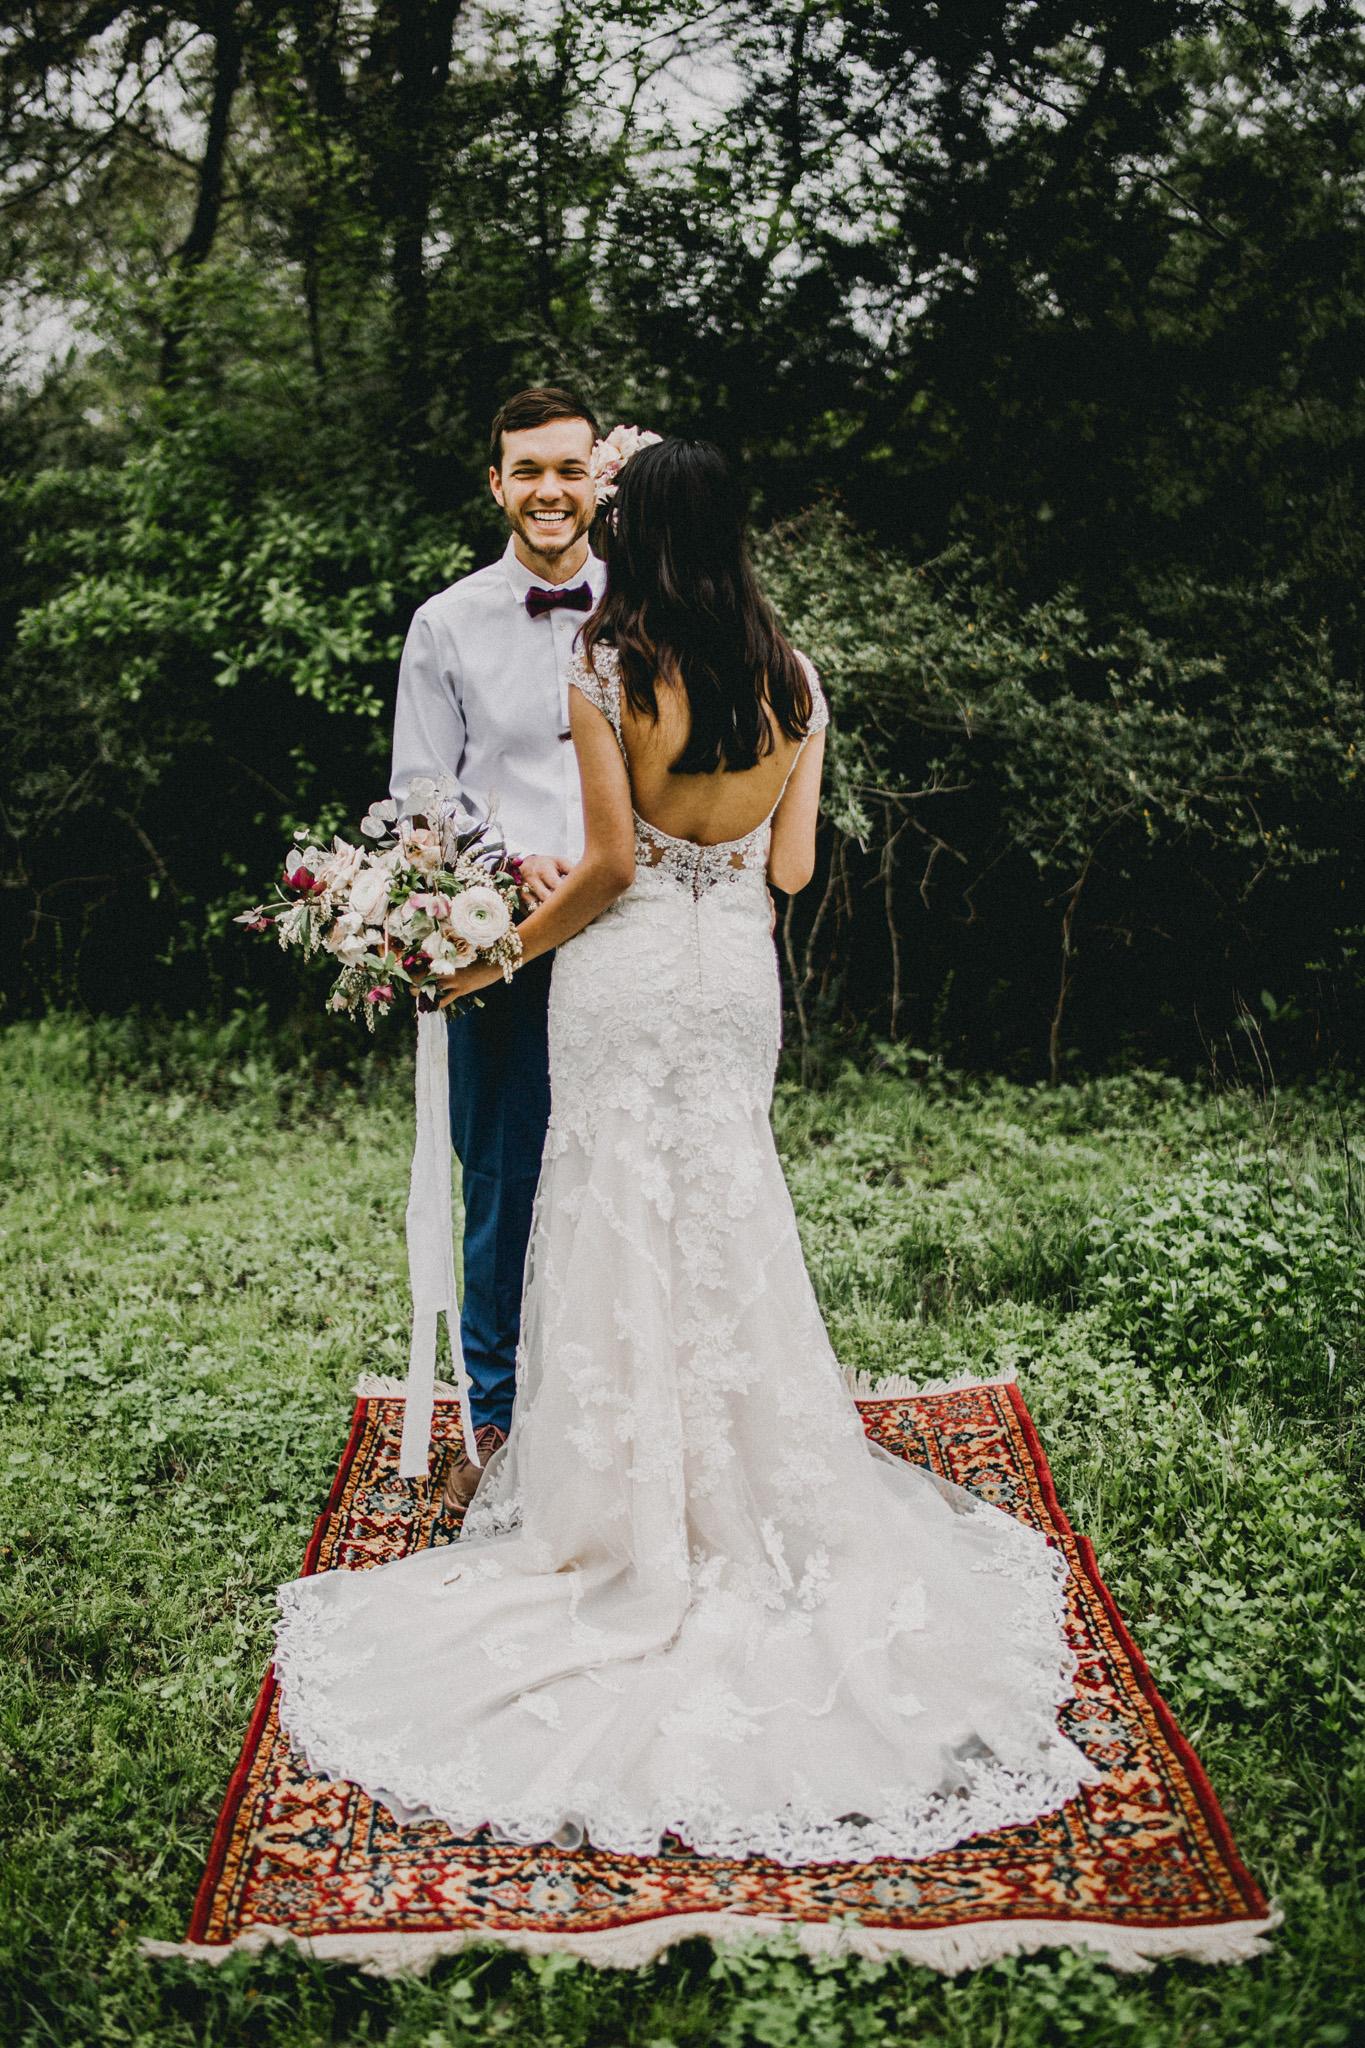 Breshears After Bridal Session Blog-6.jpg